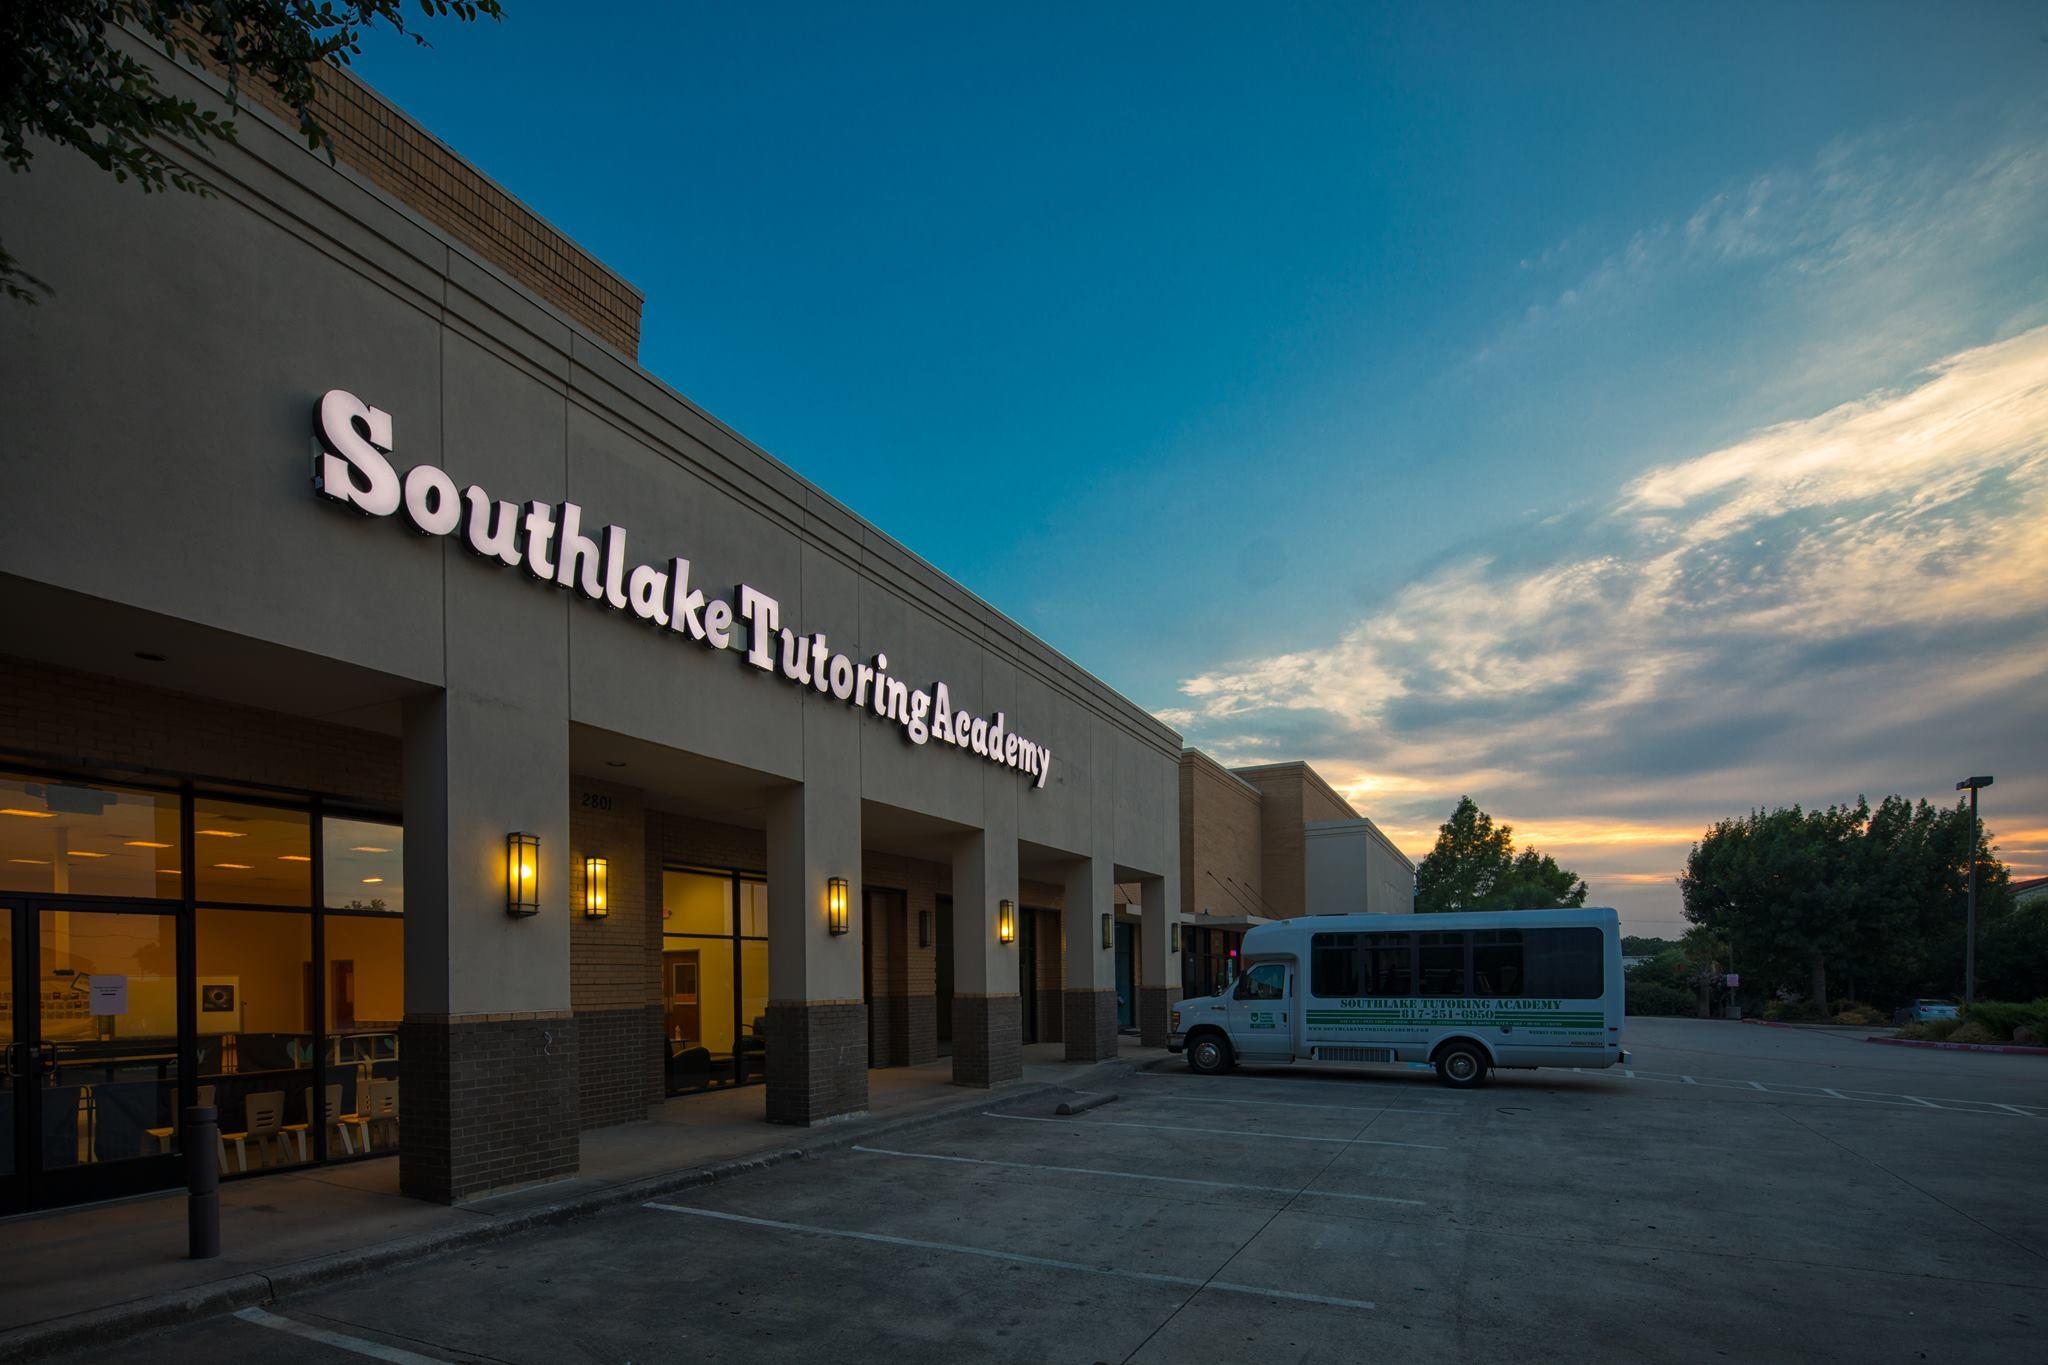 Southlake Tutoring Academy